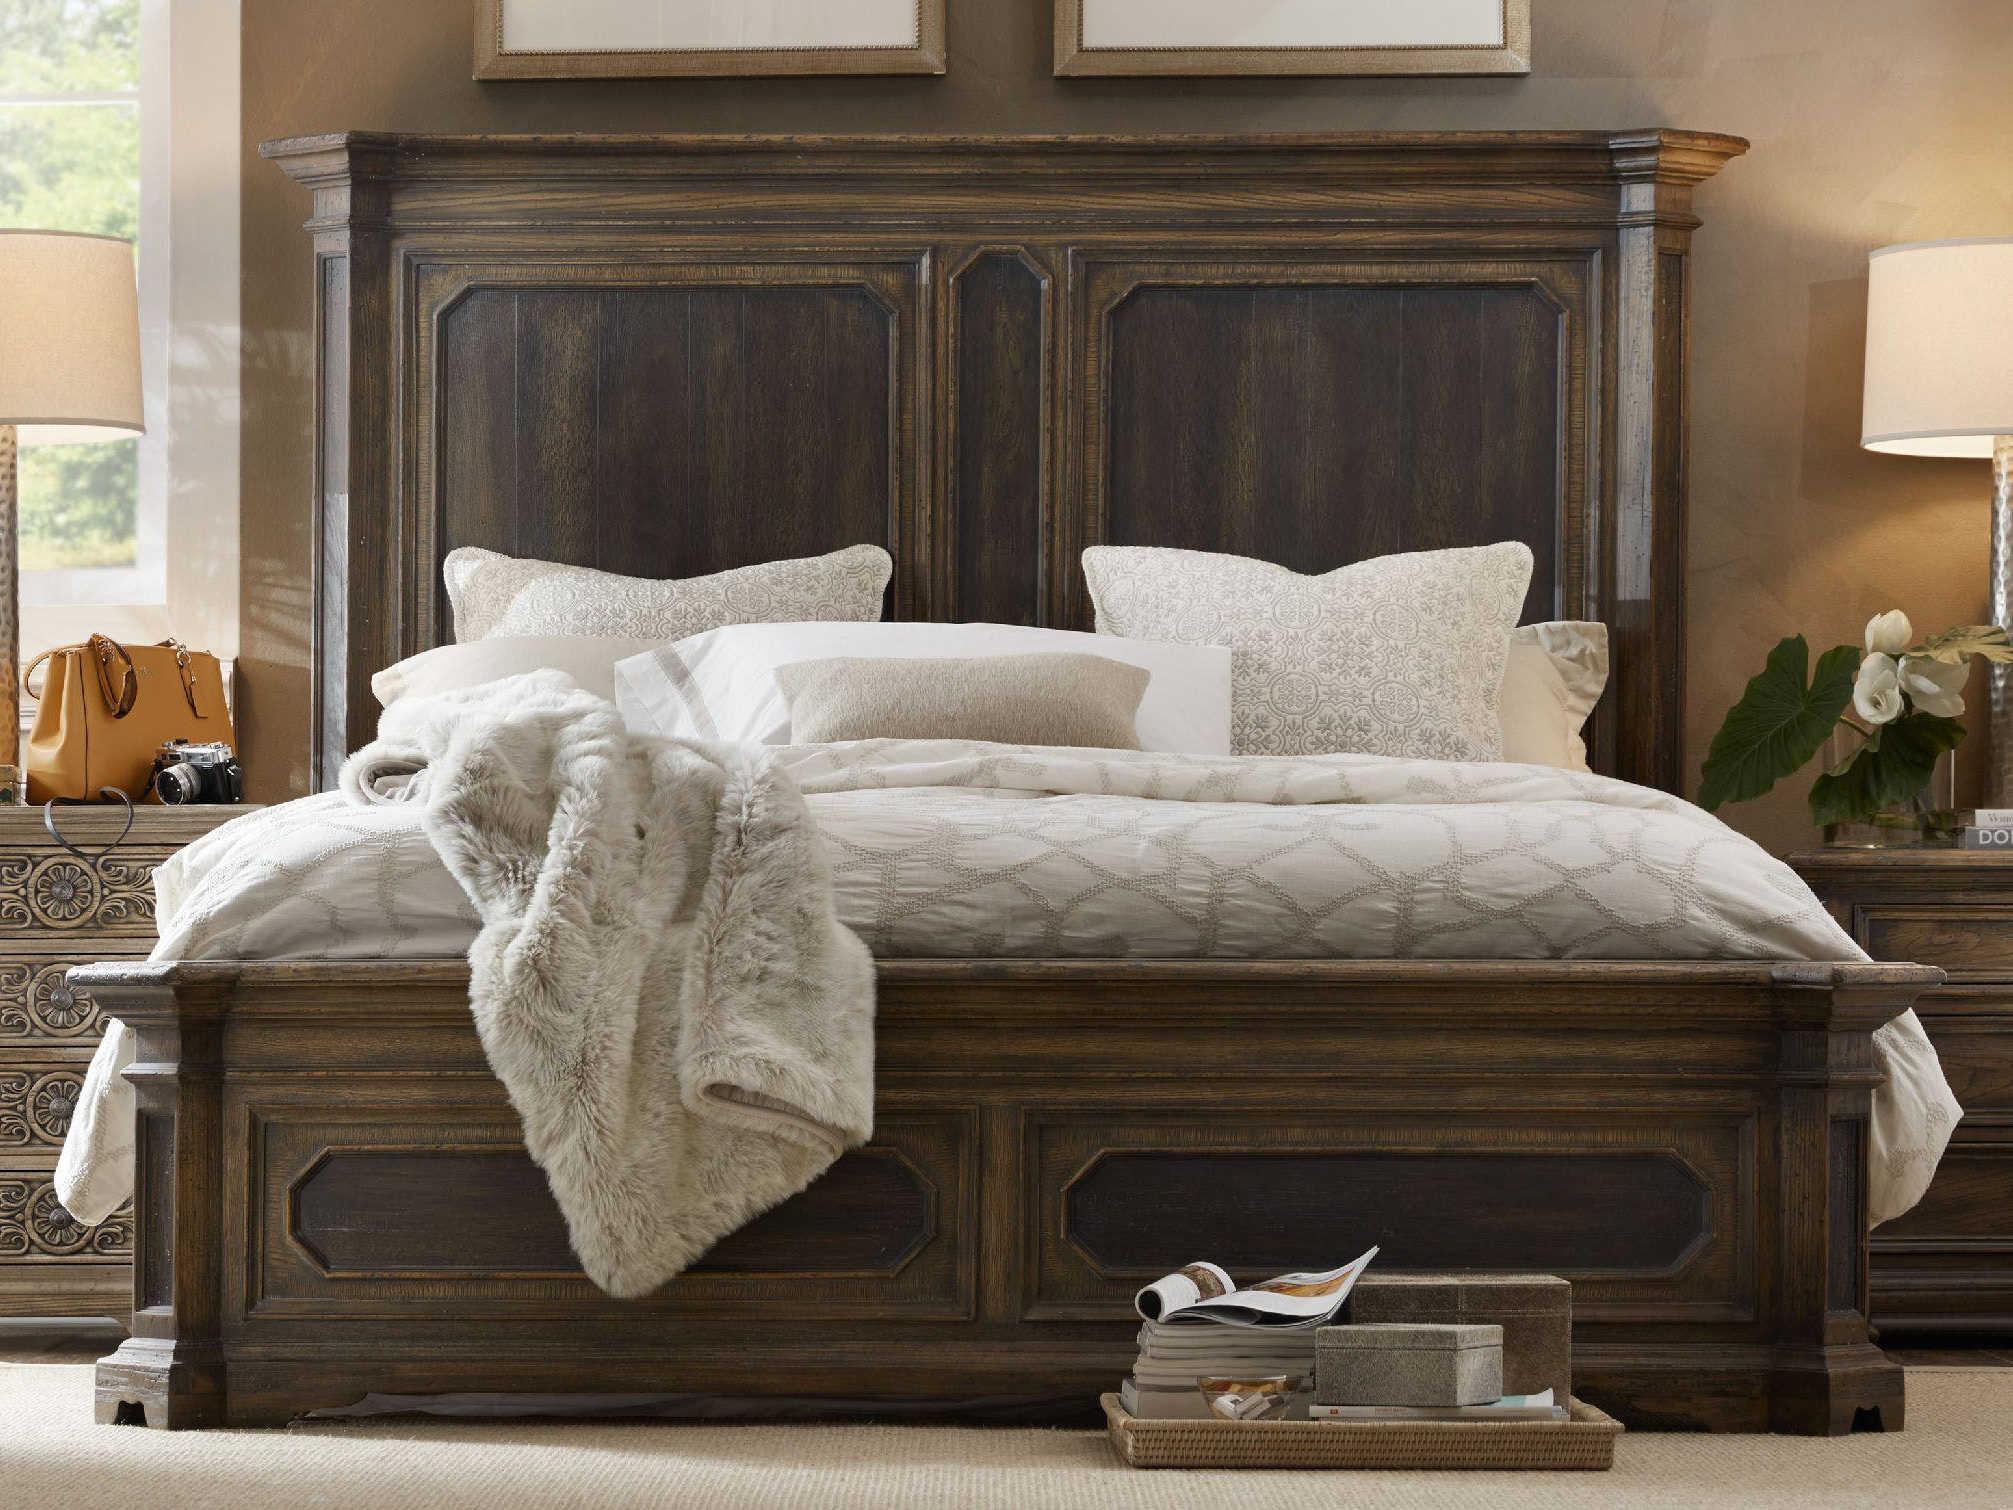 Hooker Furniture Hill Country Timeworn Saddle Brown Anthracite Black California King Size Mansion Panel Bed Hoo596090260multi